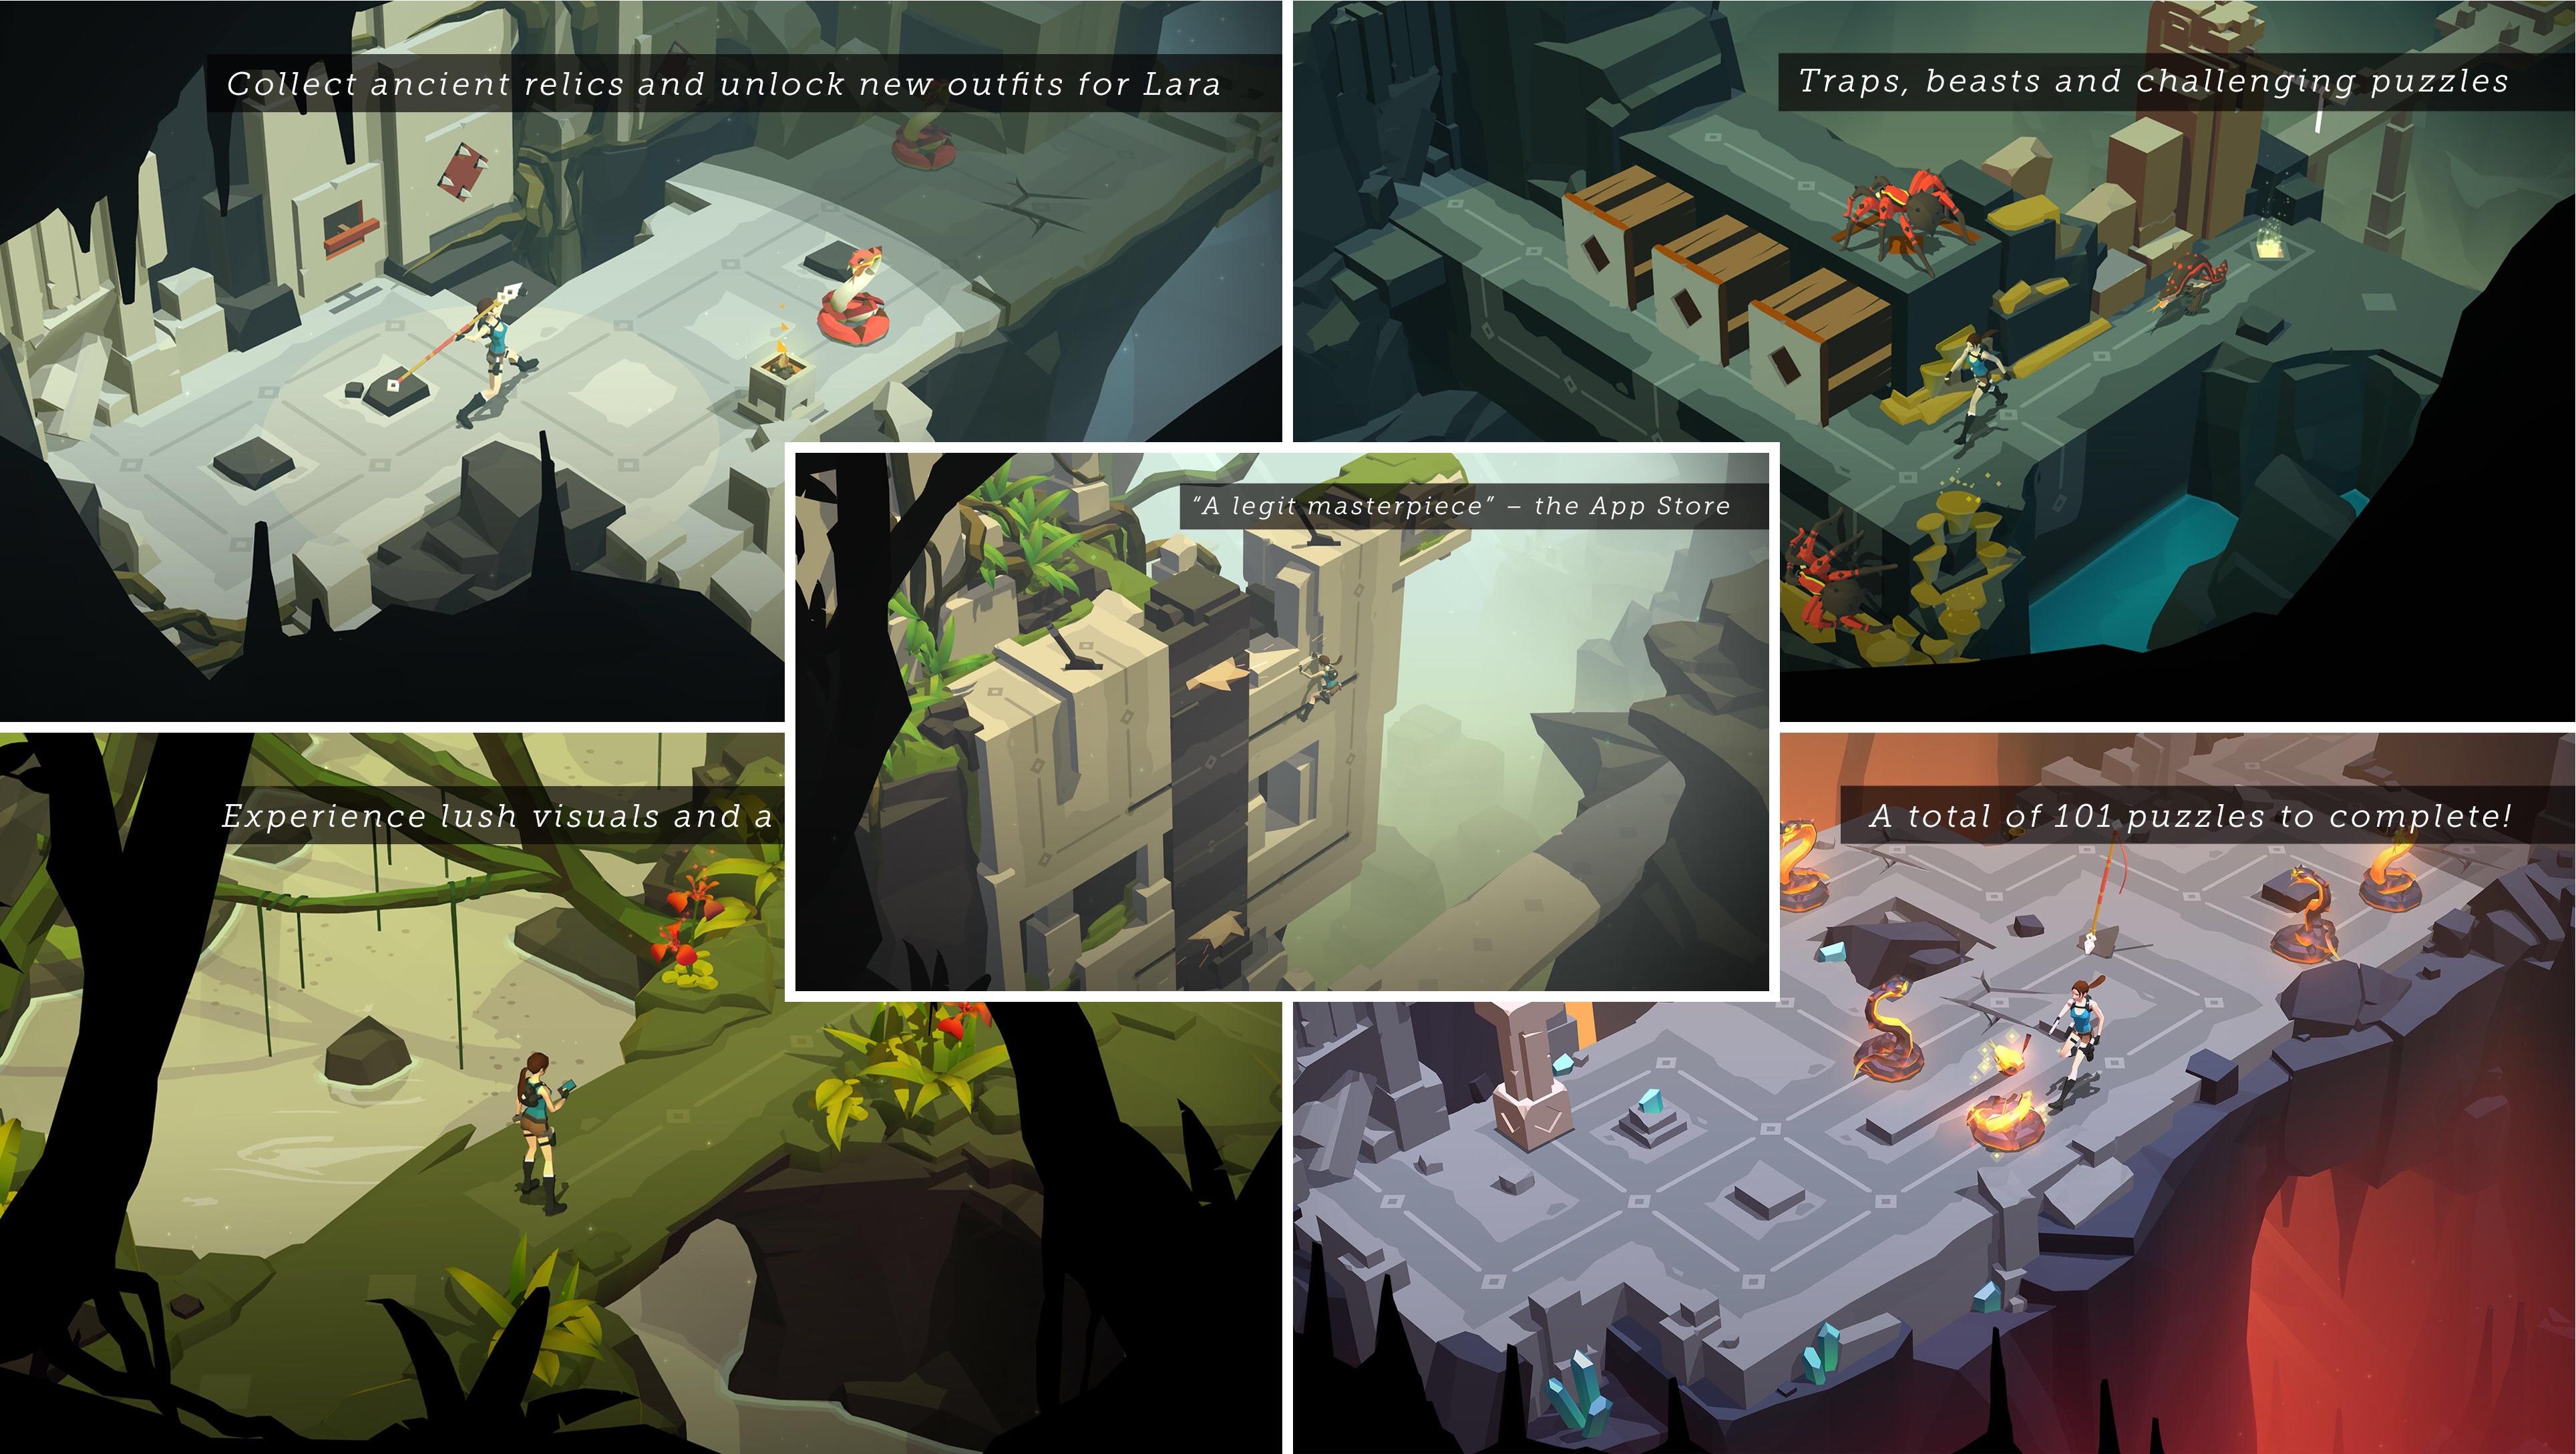 Lara-Croft-GO-for-tvOS-Apple-TV-screenshot-001